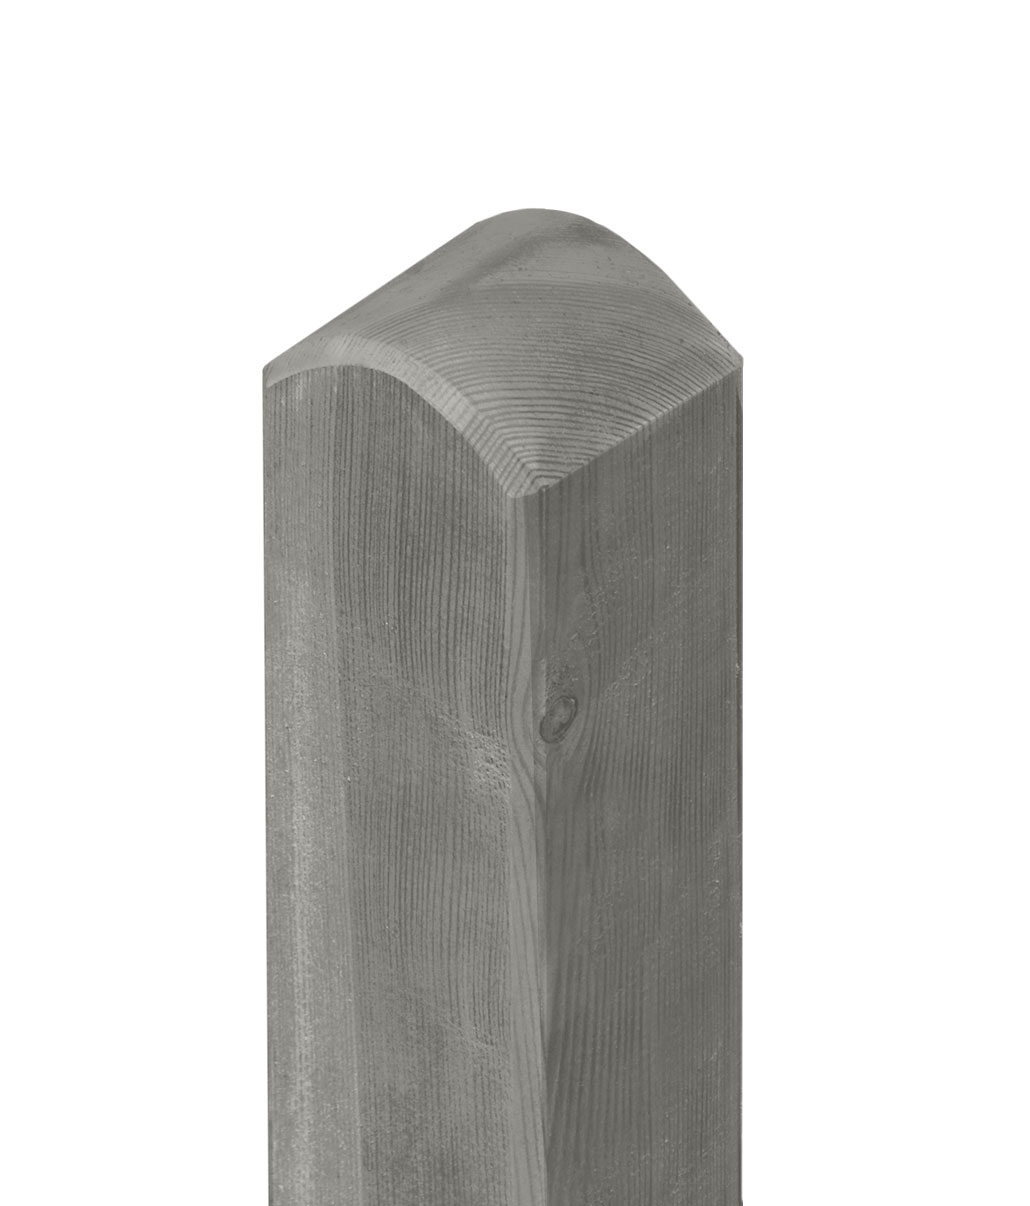 Zaunpfosten / Holzpfosten Rundkopf KDI grau 9x9cm Länge 190cm Bild 1